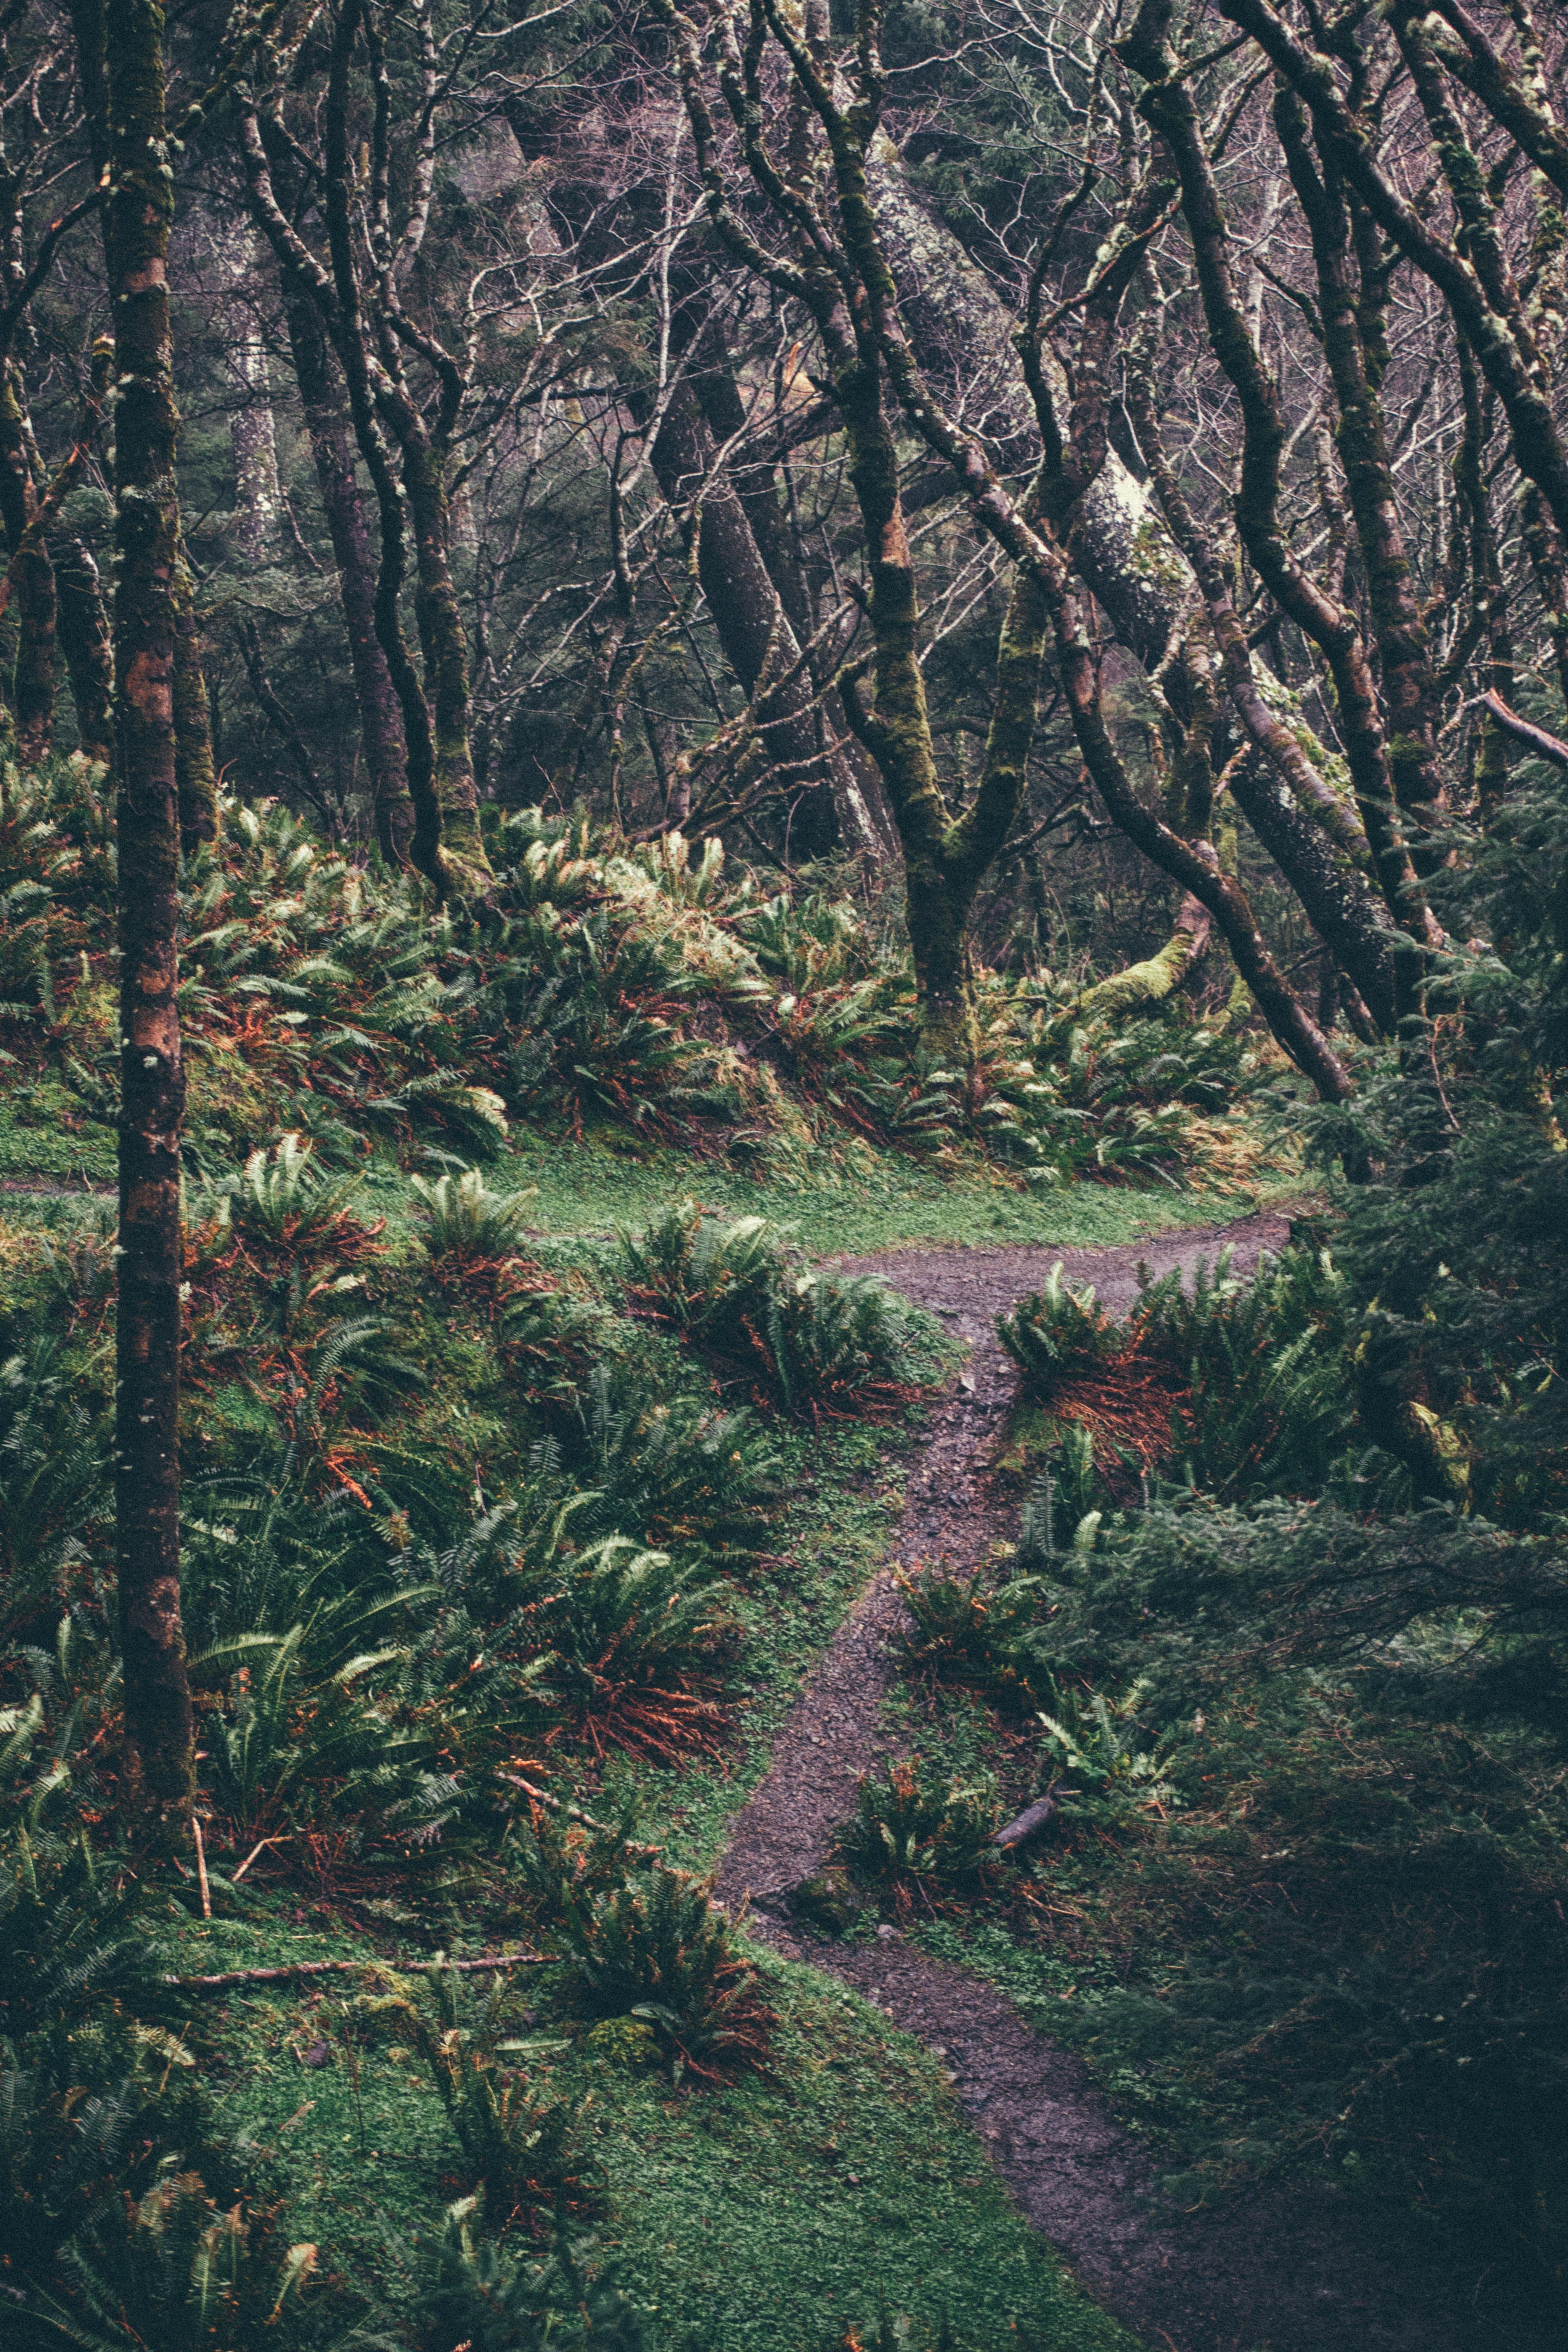 green leaf bush lined dirt road at daytime